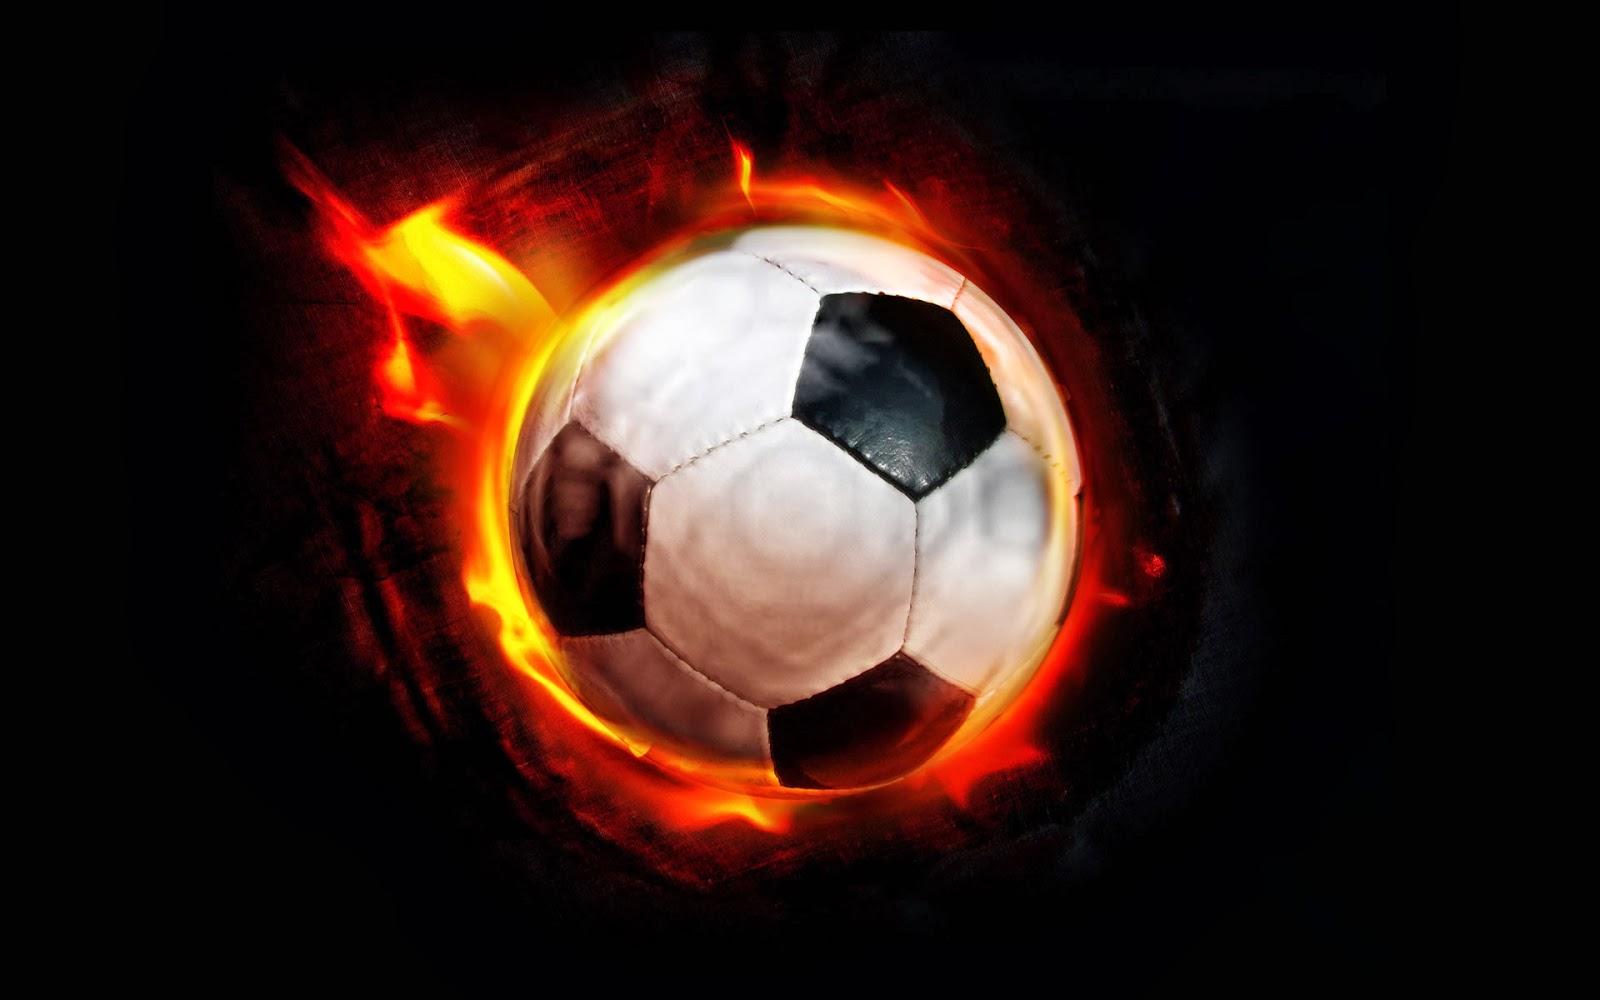 Descargar imagenes de futbol para celular for Fotos de futbol para fondo de pantalla